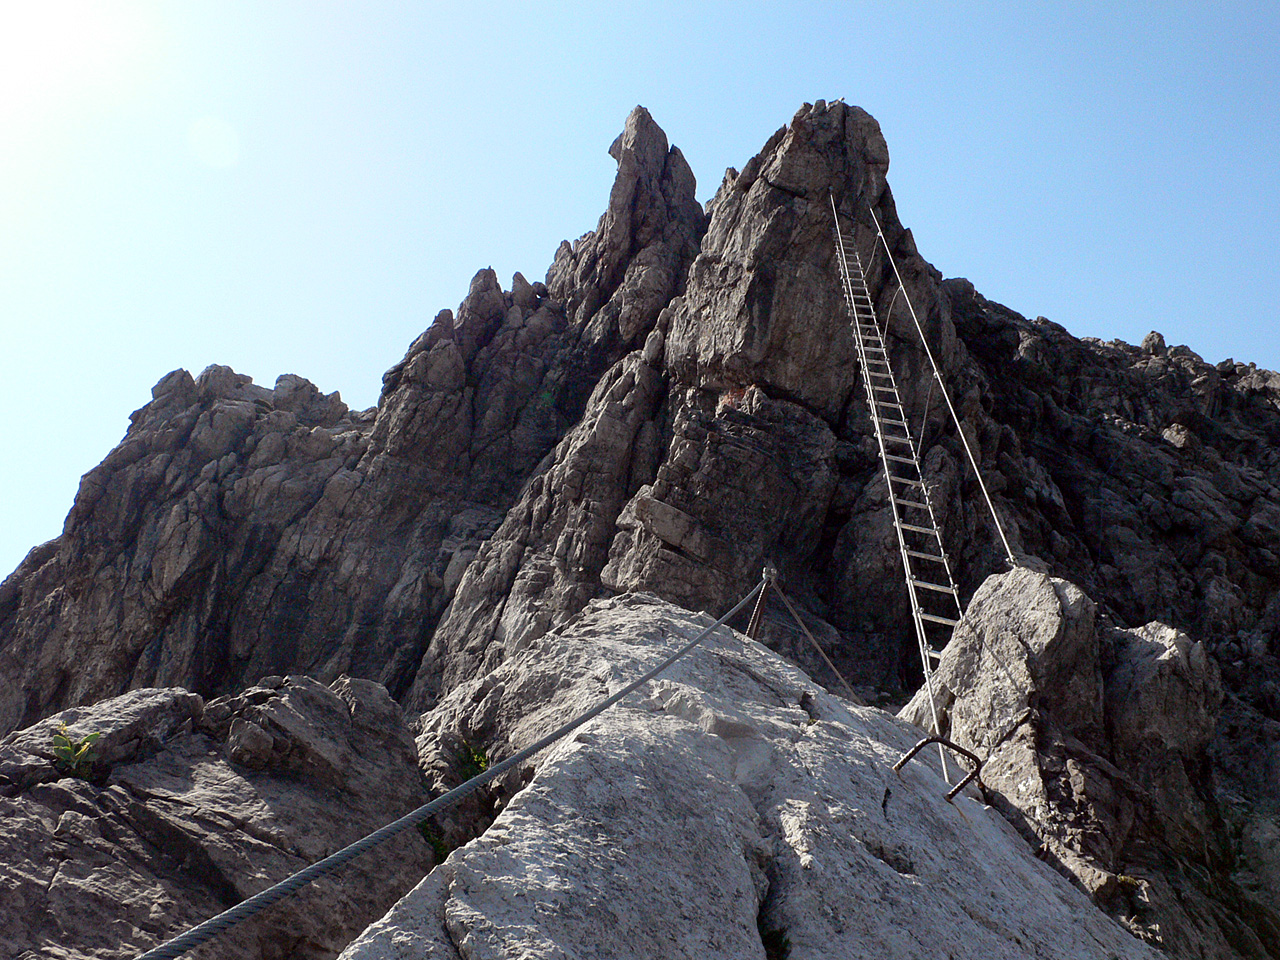 Klettersteig Lünersee : Klettersteig saula ostwand